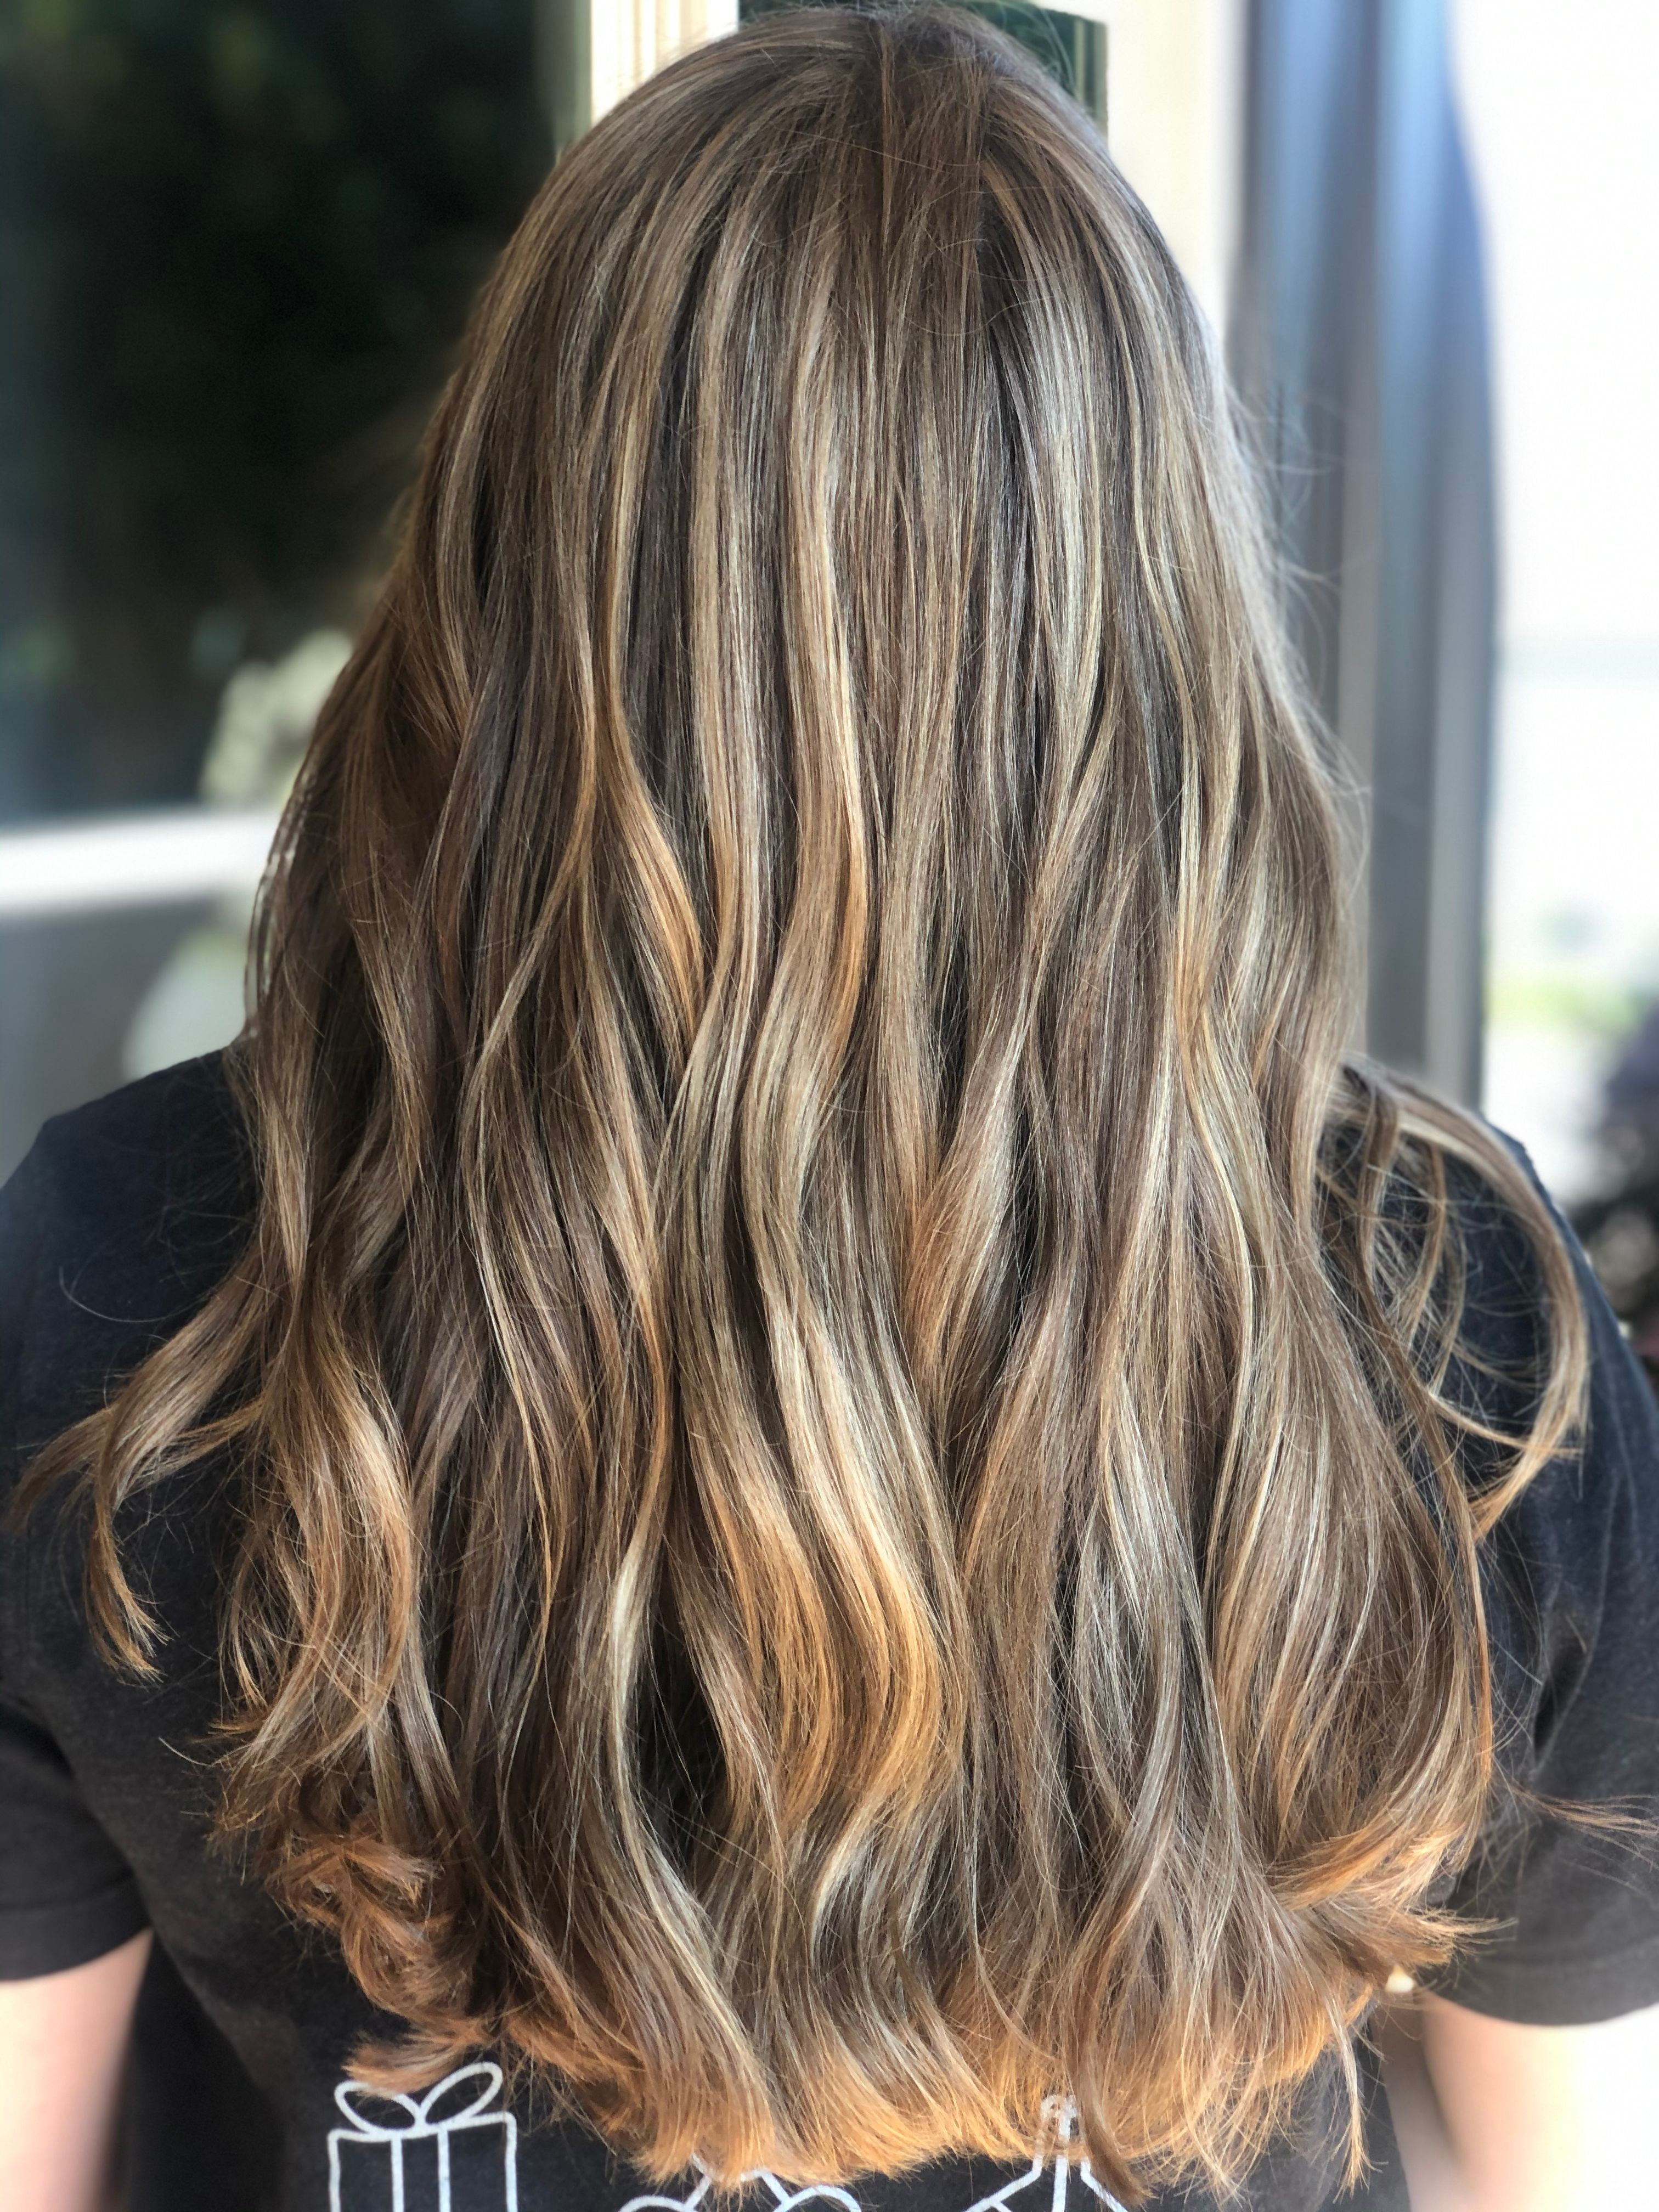 Hair Salon Easley Sc Haircuts Hair Color Balayage Bridal Hair Men S Hair Hair Salons Near Me Easley Sc Greenville Sc Anderson Sc In 2020 Beautiful Blonde Long Hair Styles Hair Styles